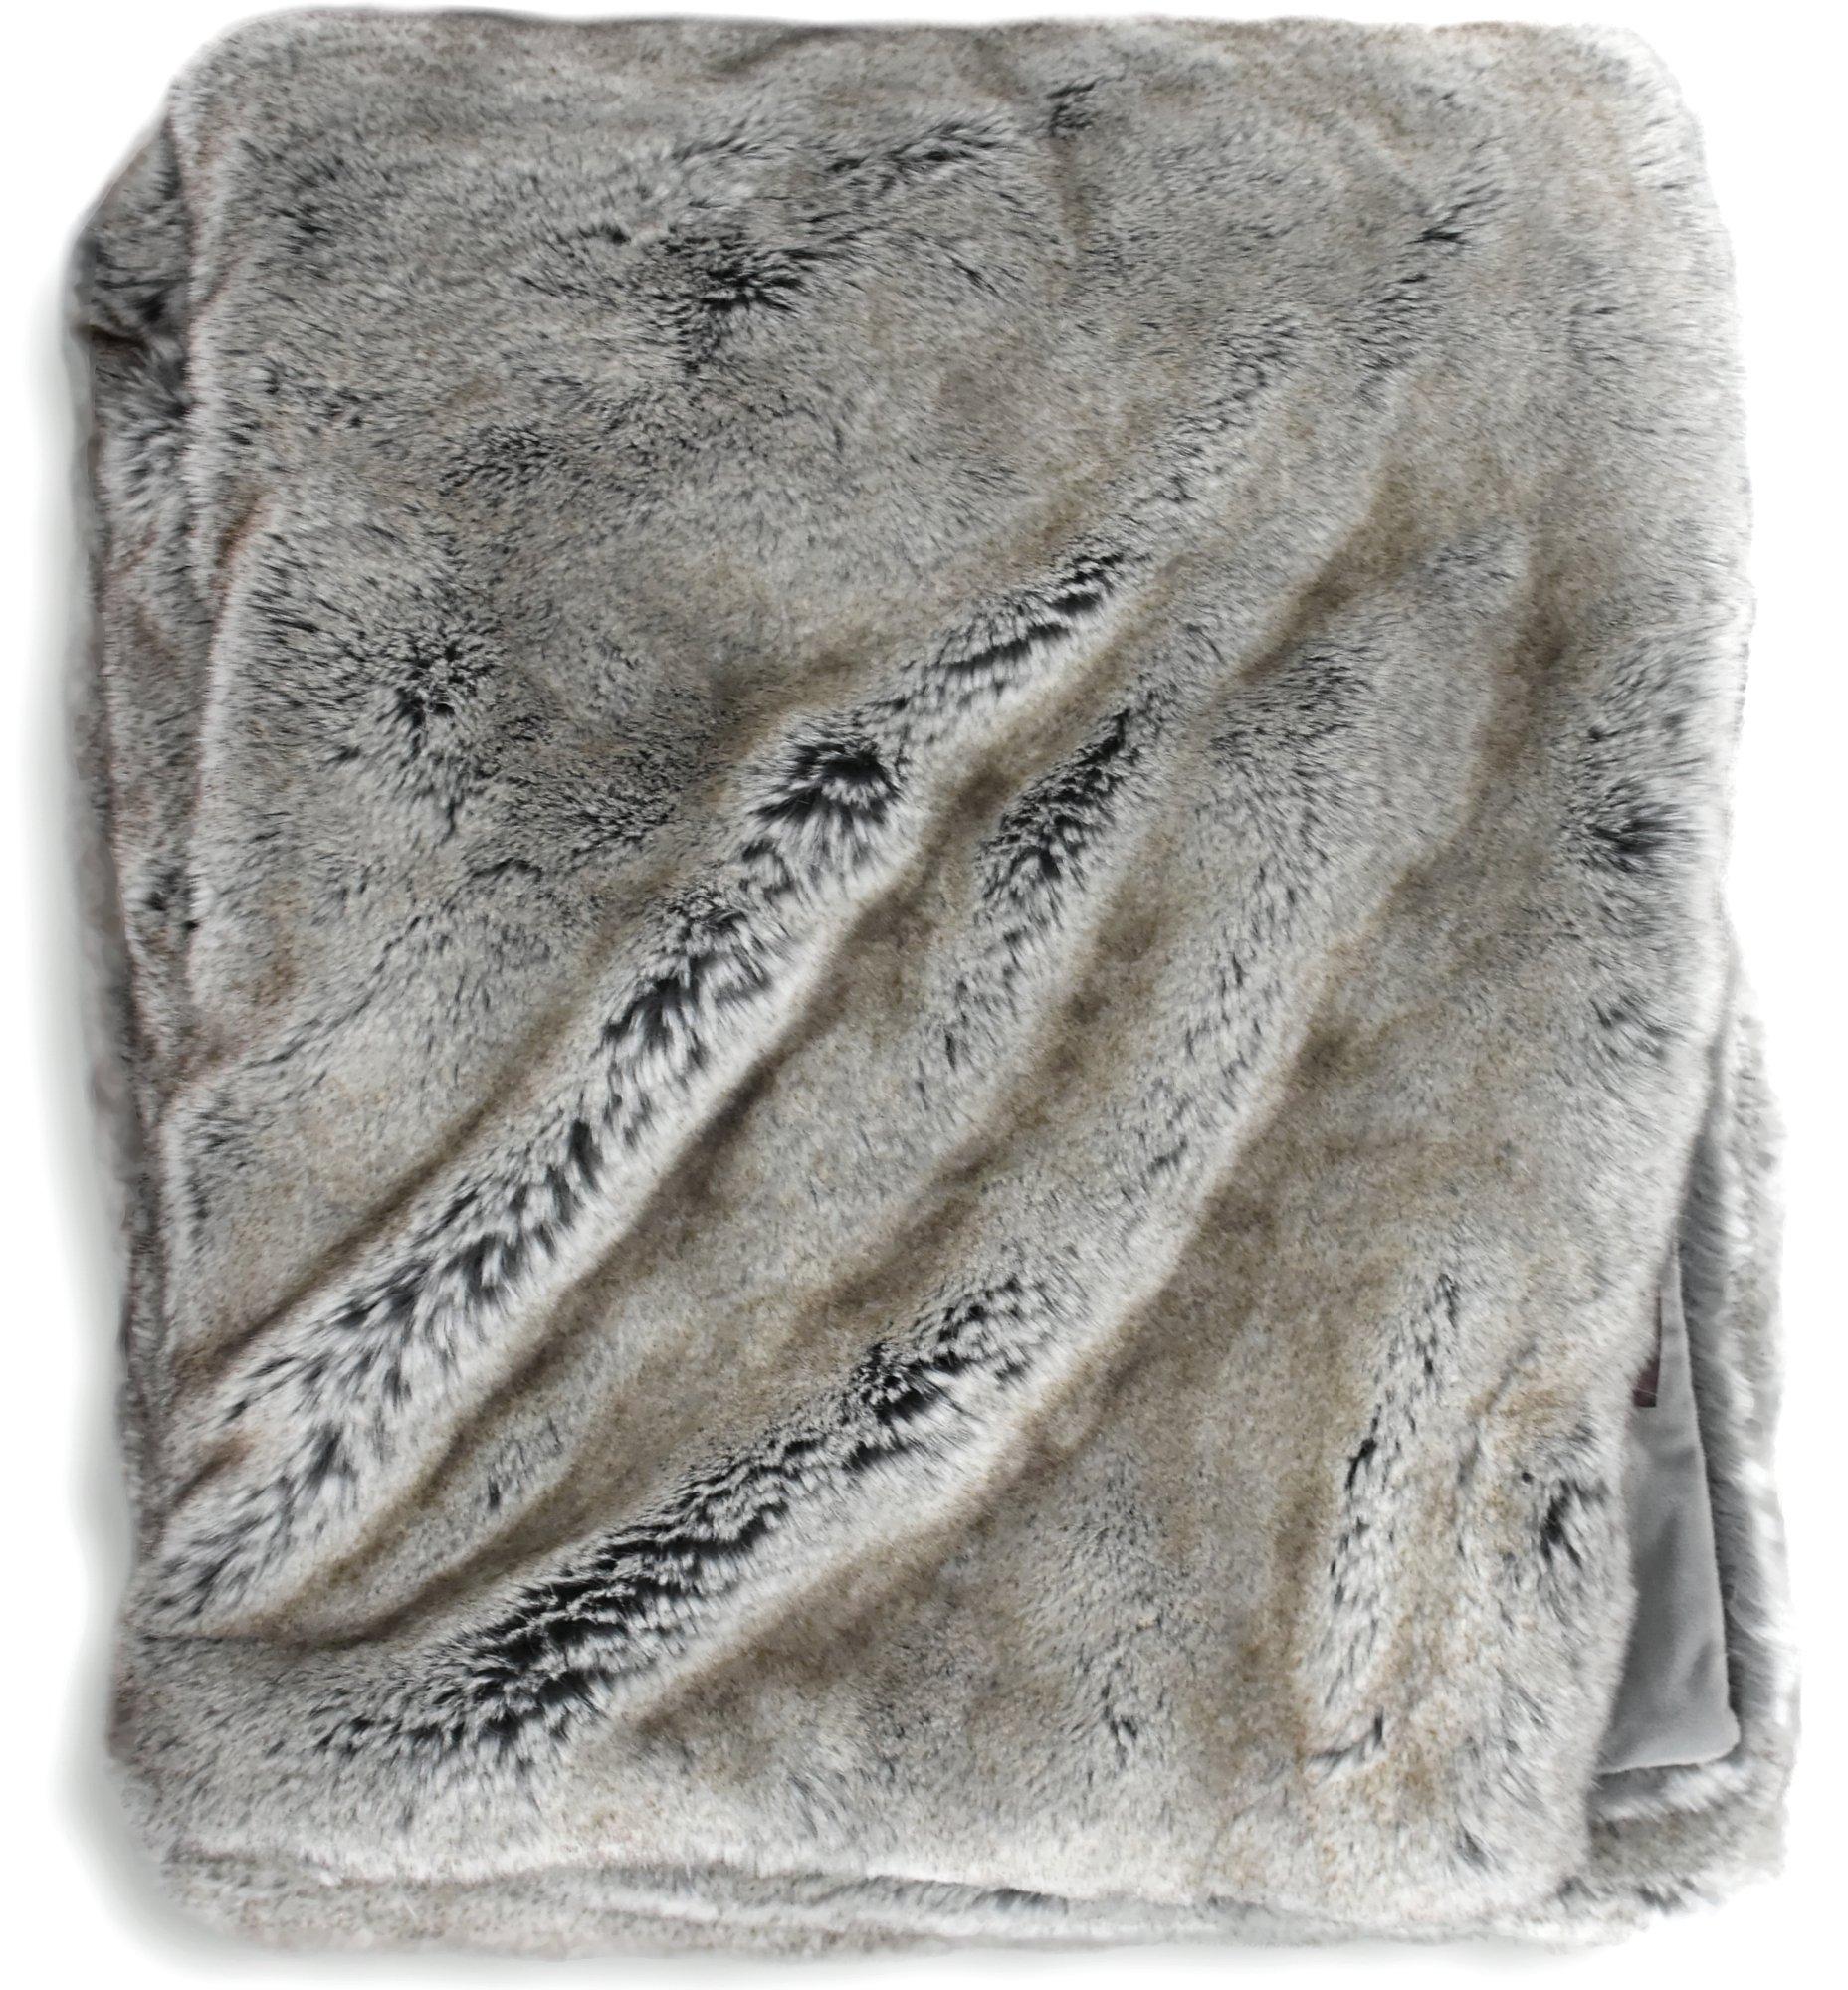 Luxury Faux Fur Oversized Throw Blanket with Plush Velvet Reverse, Fox Lynx or Gray Mink (Grey) by Soft Throw